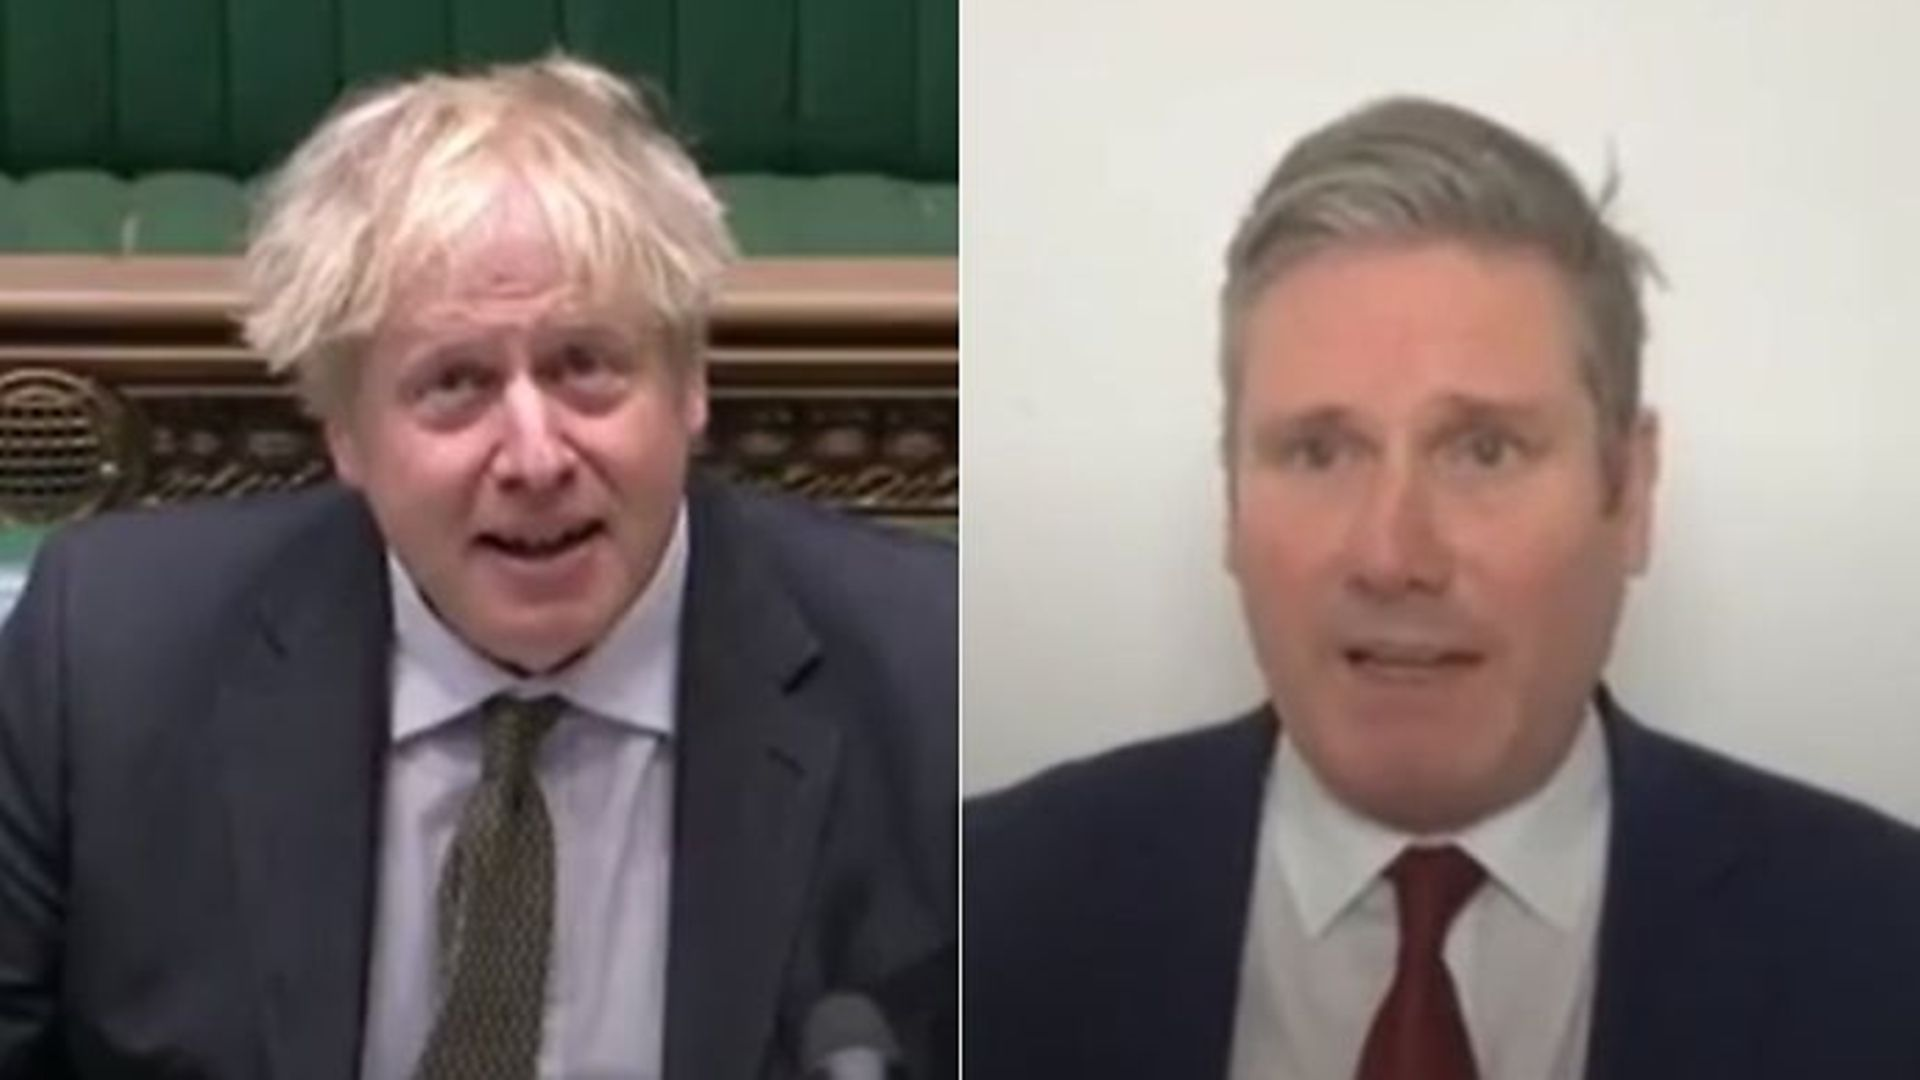 Boris Johnson (L) and Keir Starmer (R) - Credit: Parliamentlive.tv